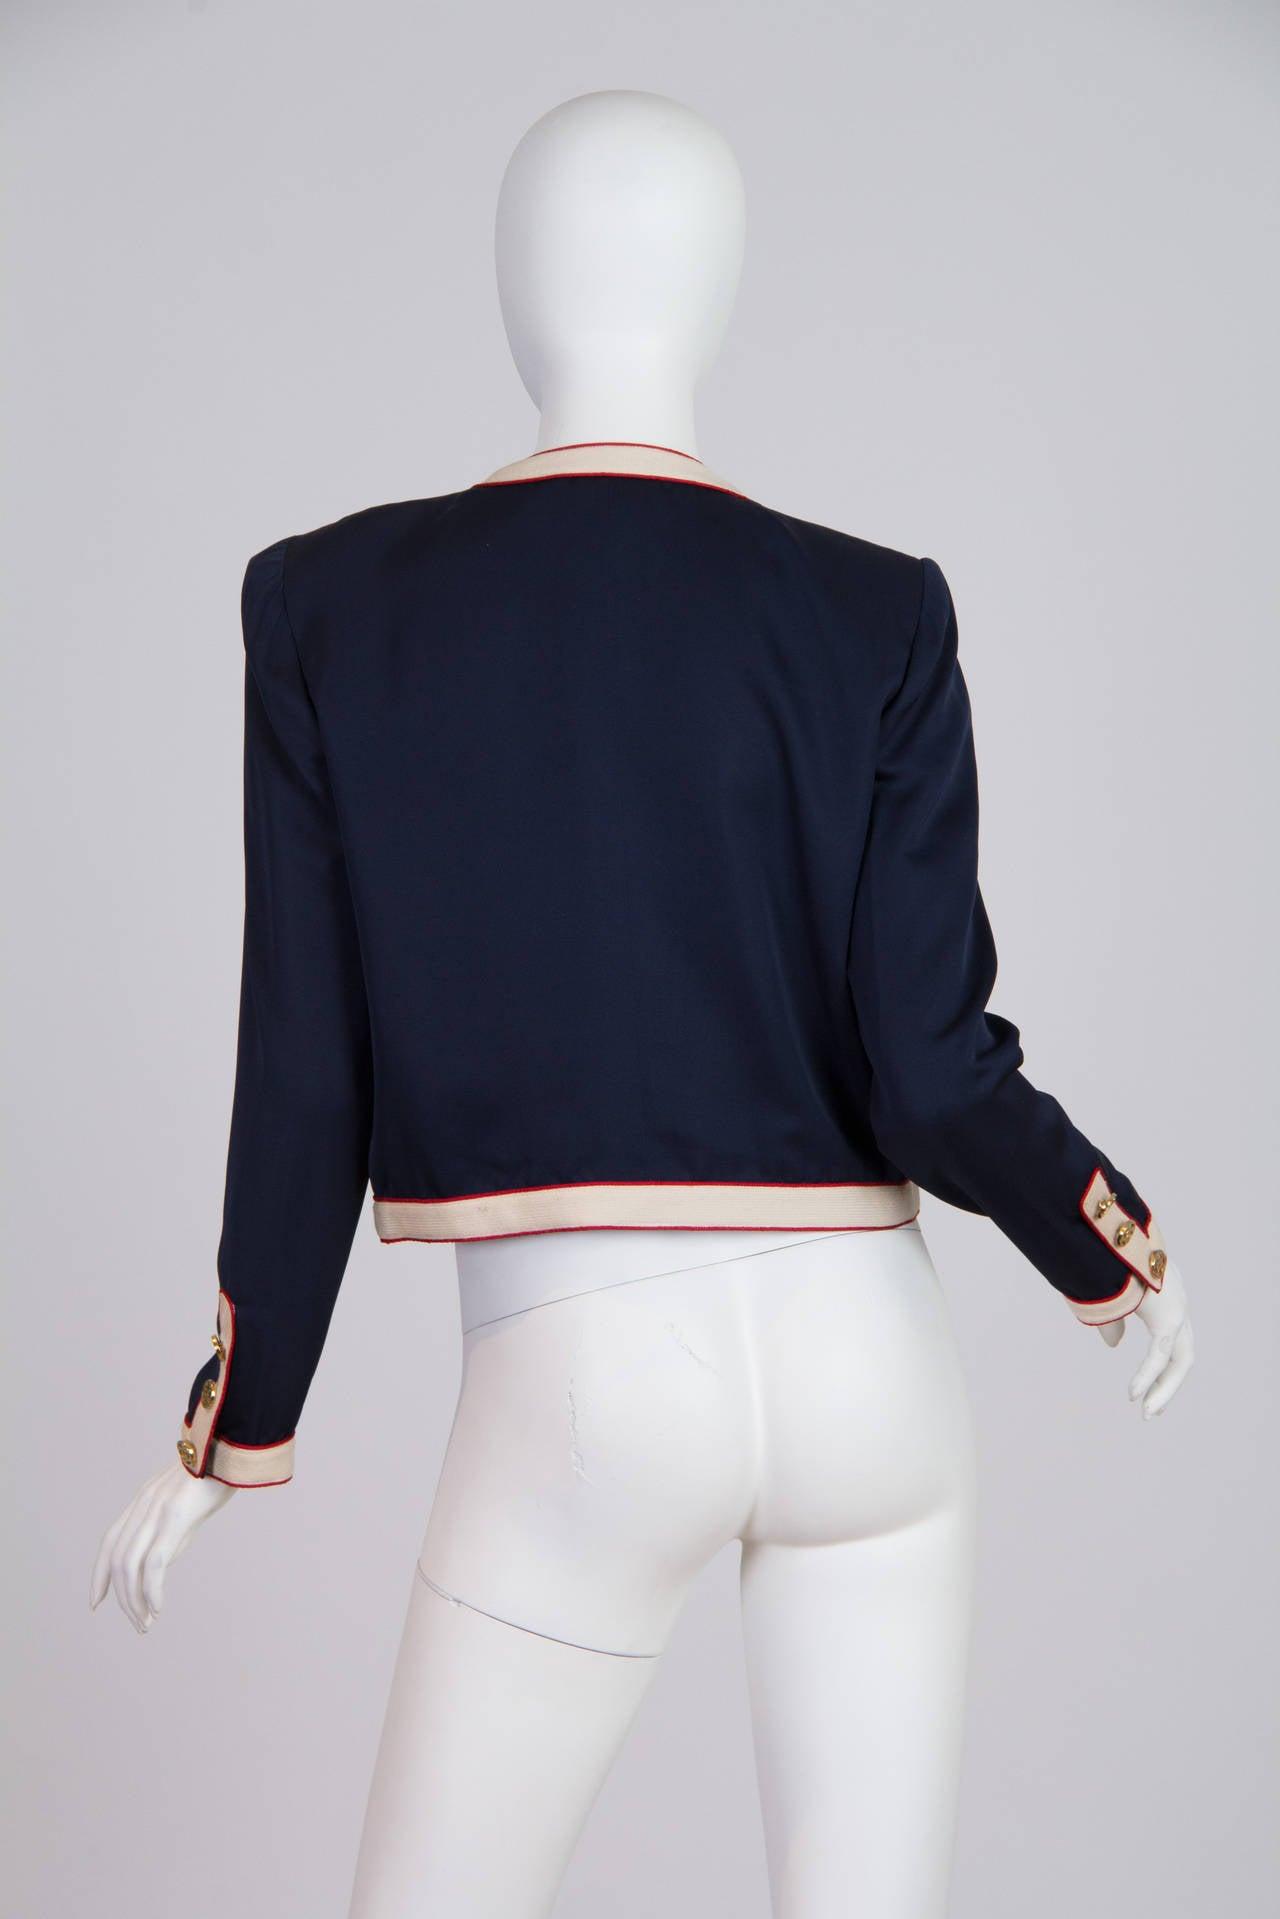 Classic Chanel Jacket 2